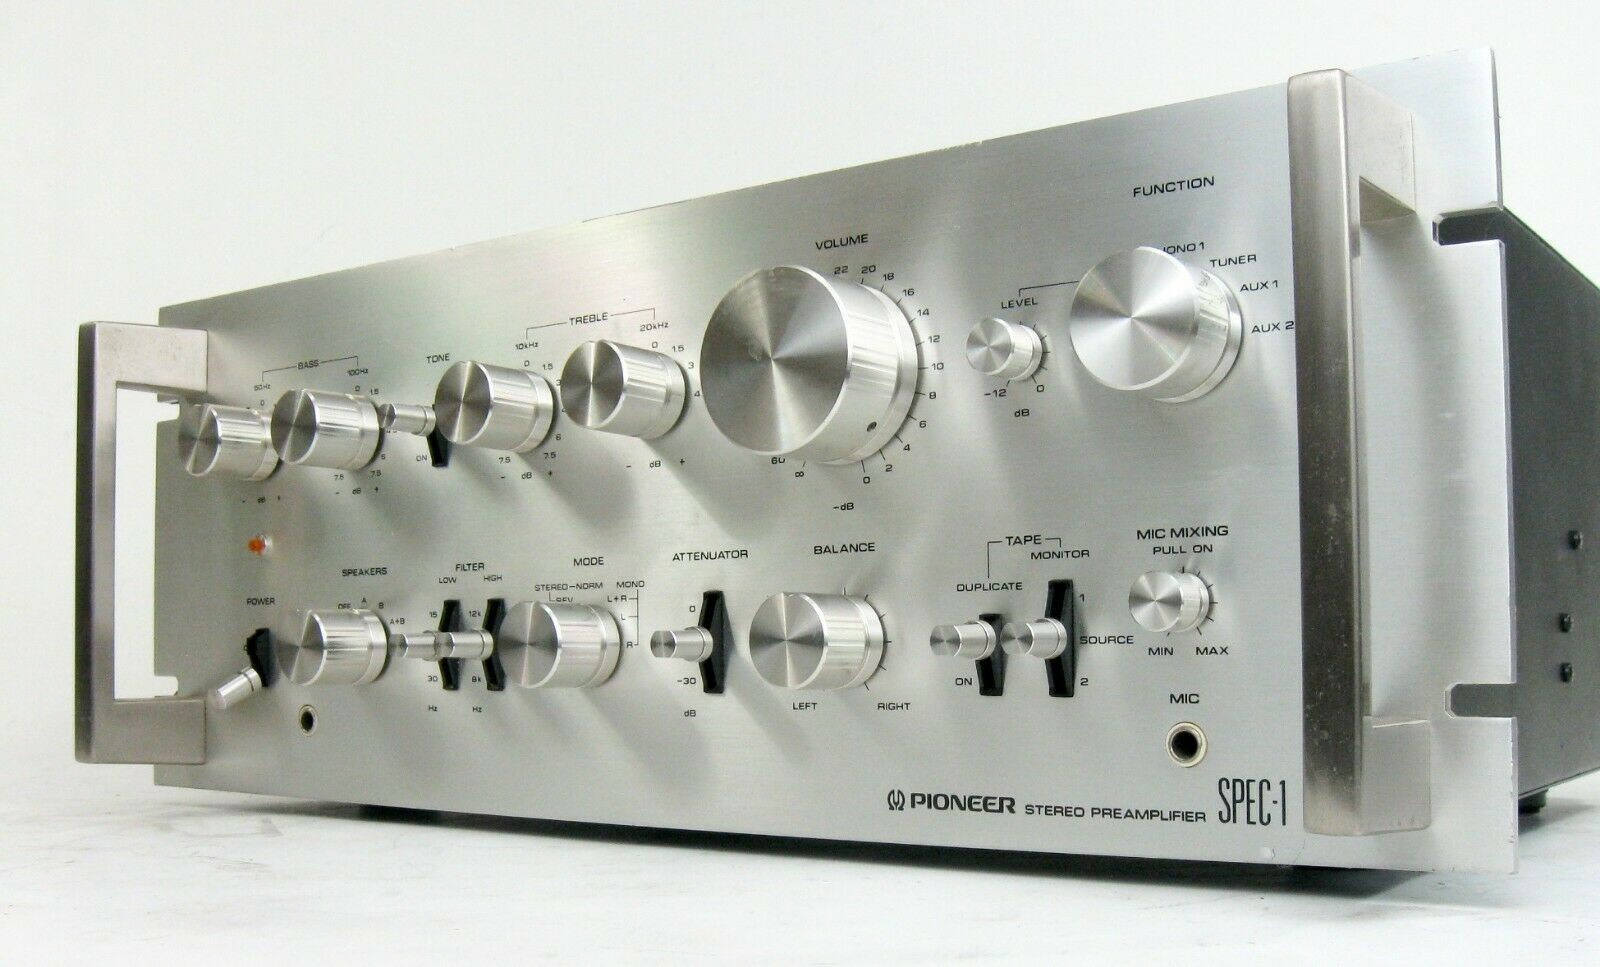 Pioneer spec-1 vintage stereo preamplifier preamp serviced